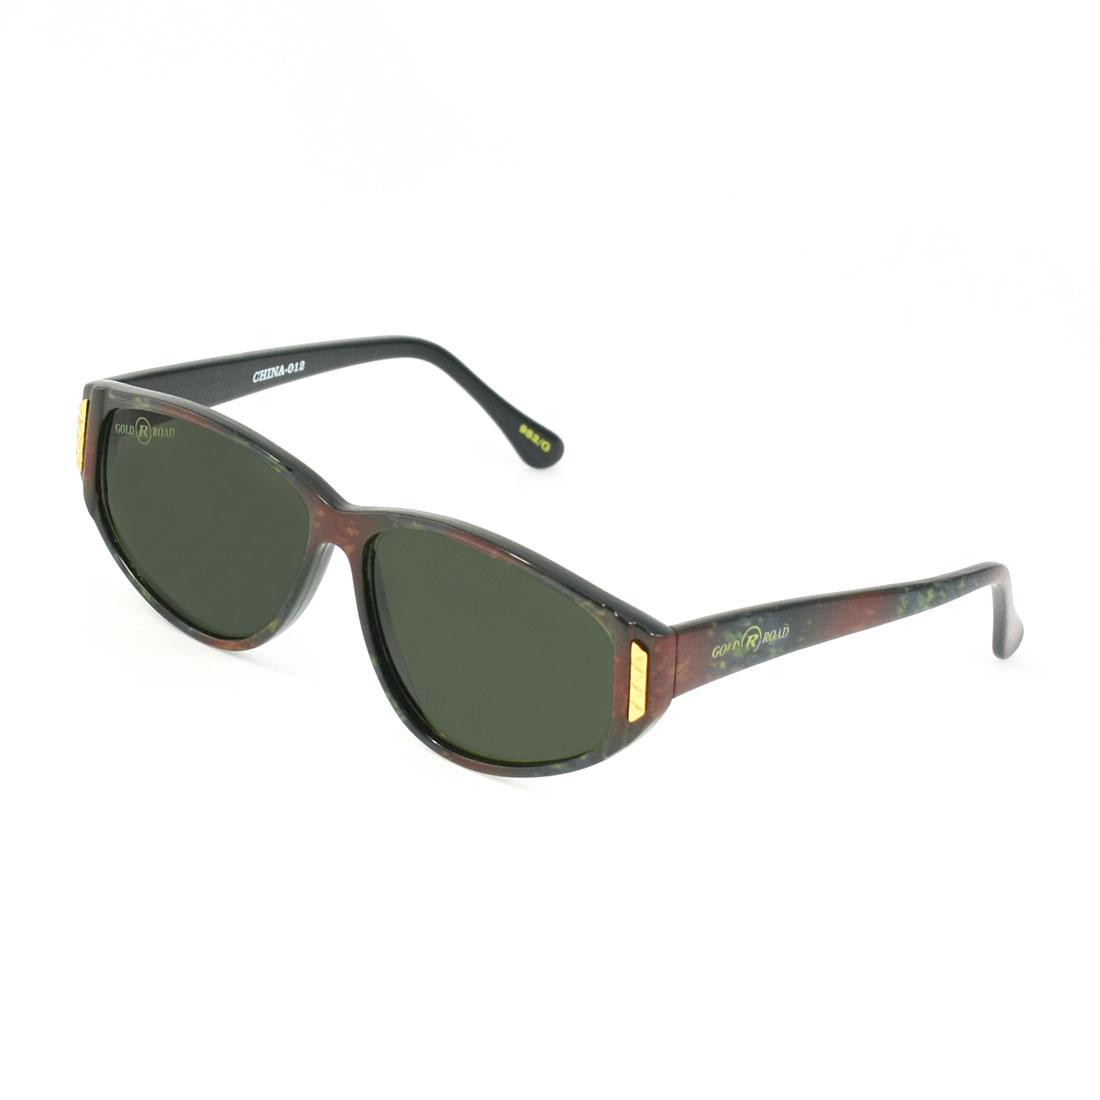 Clear Black Lens Metal Decor Painted Full Rim Sunglasses Eyeglasses for Ladies